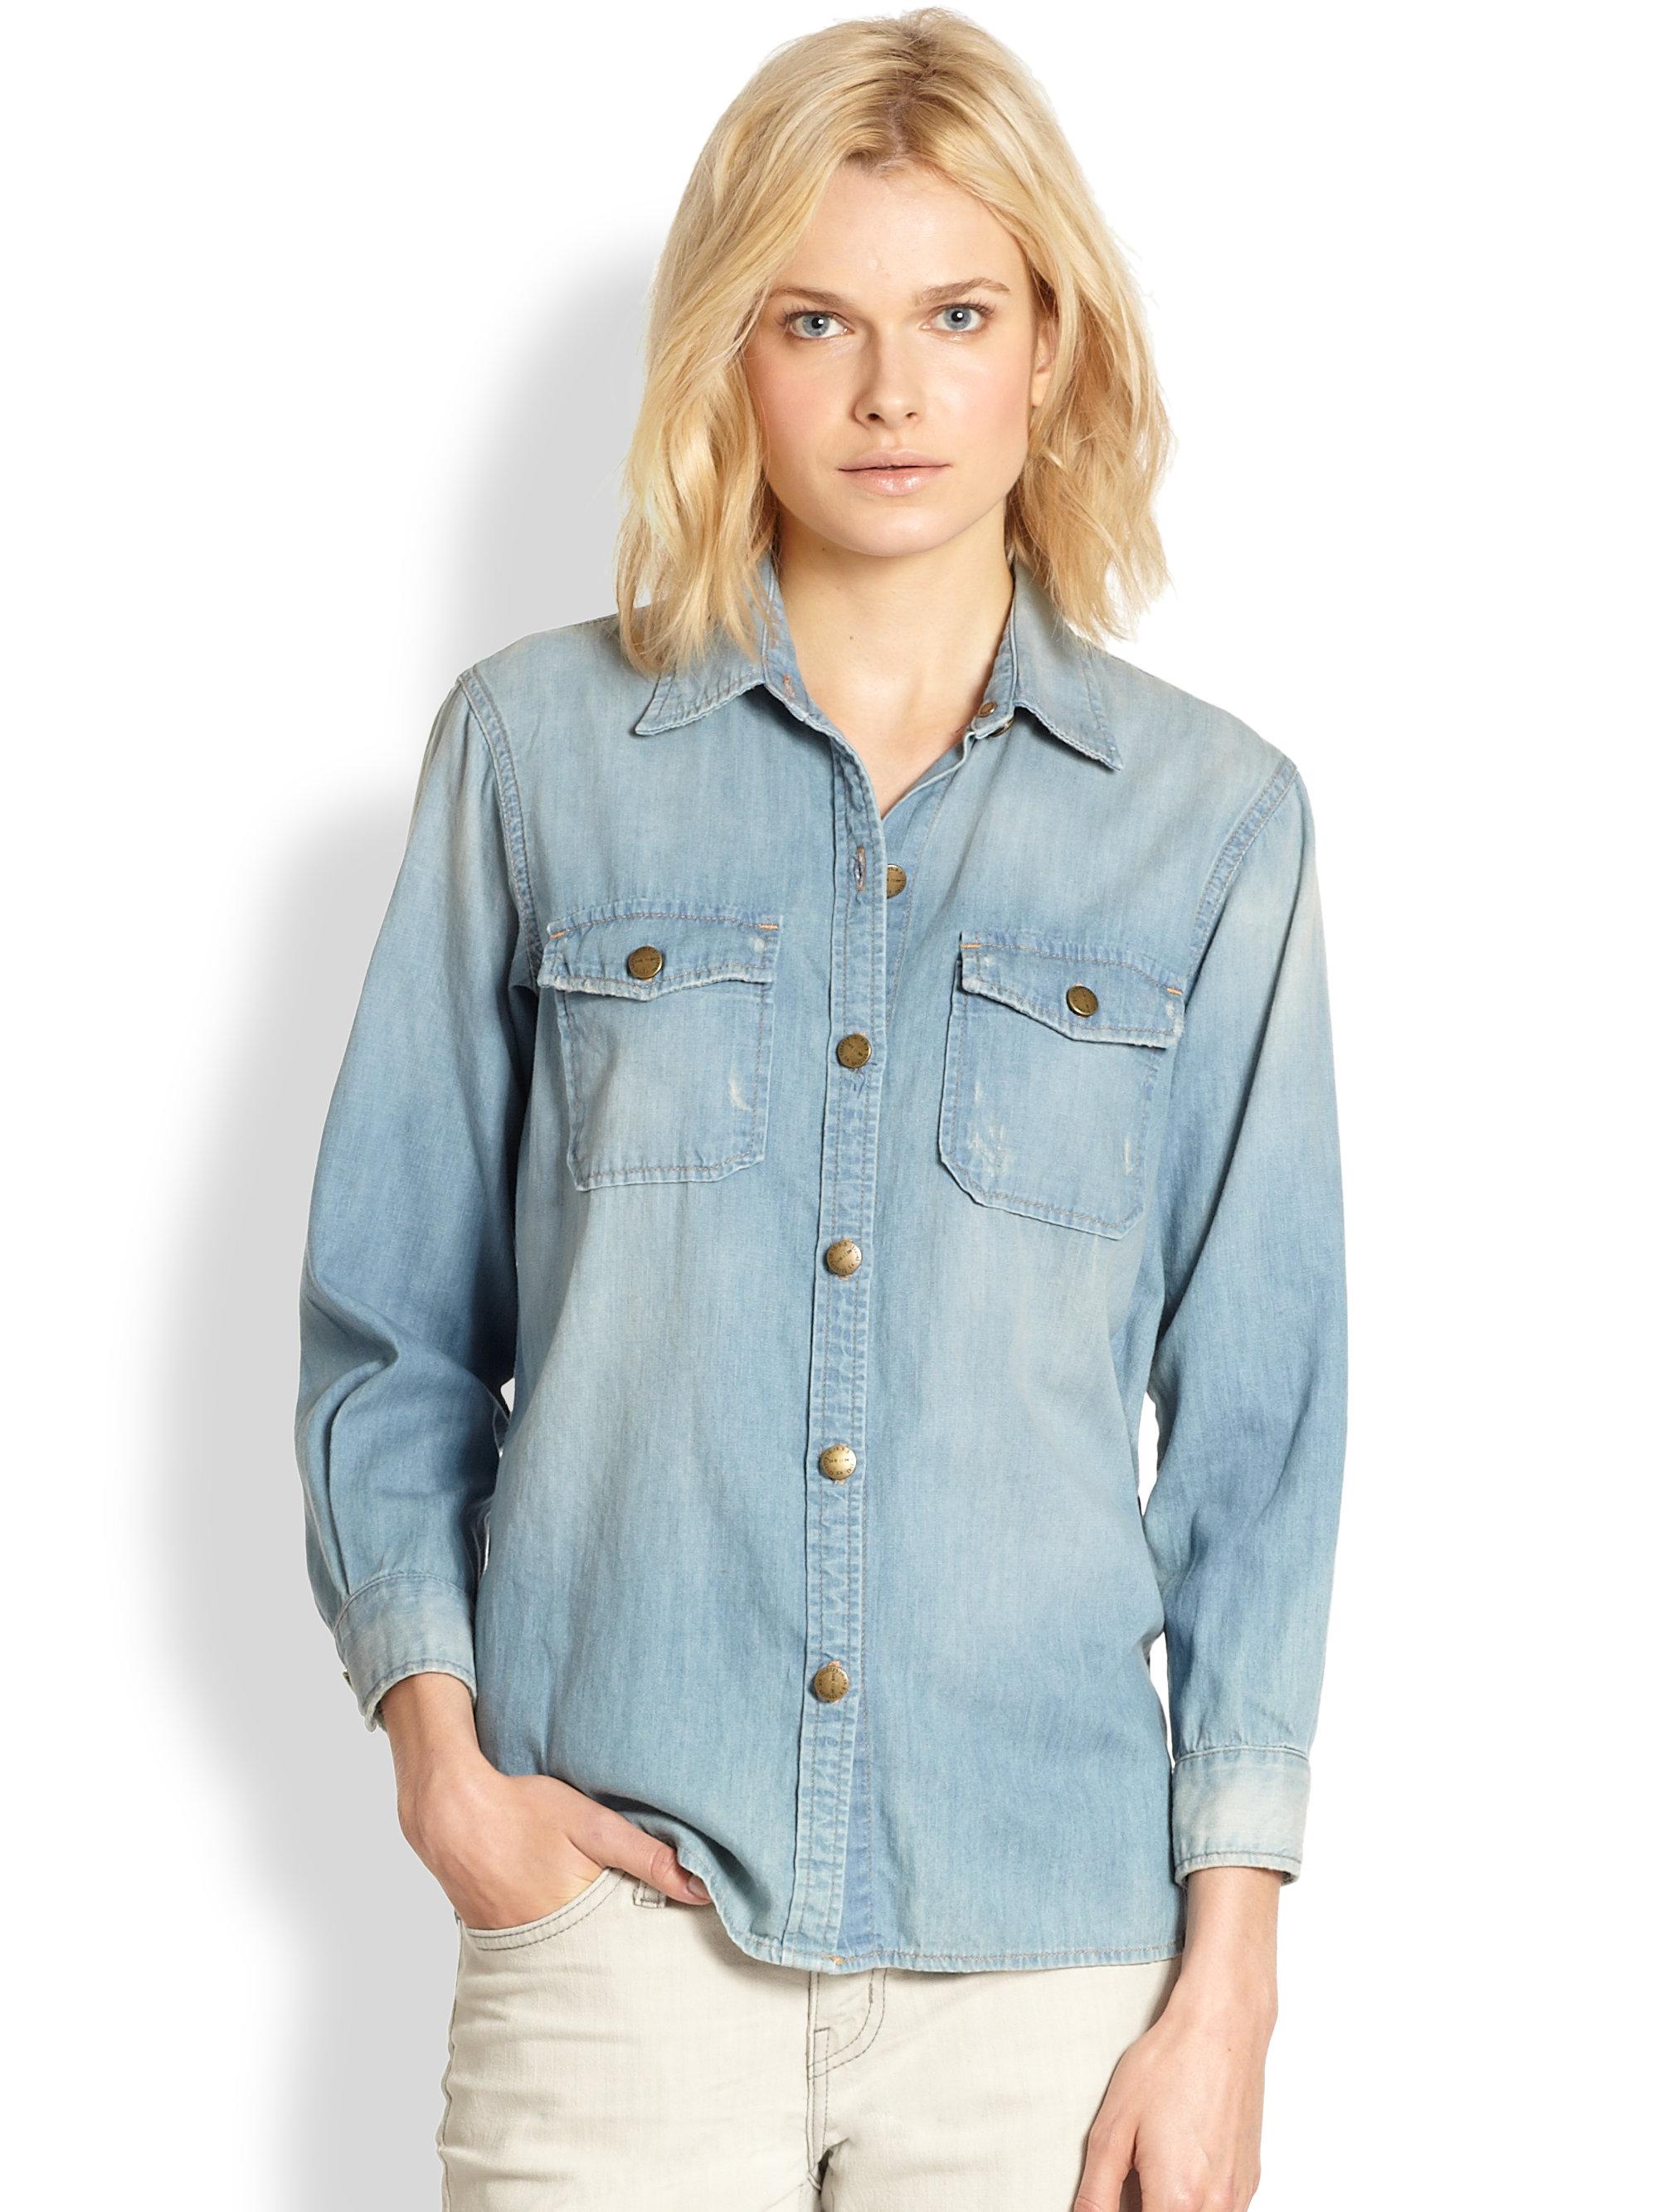 758d79dac0 Lyst - Current Elliott The Perfect Denim Shirt in Blue